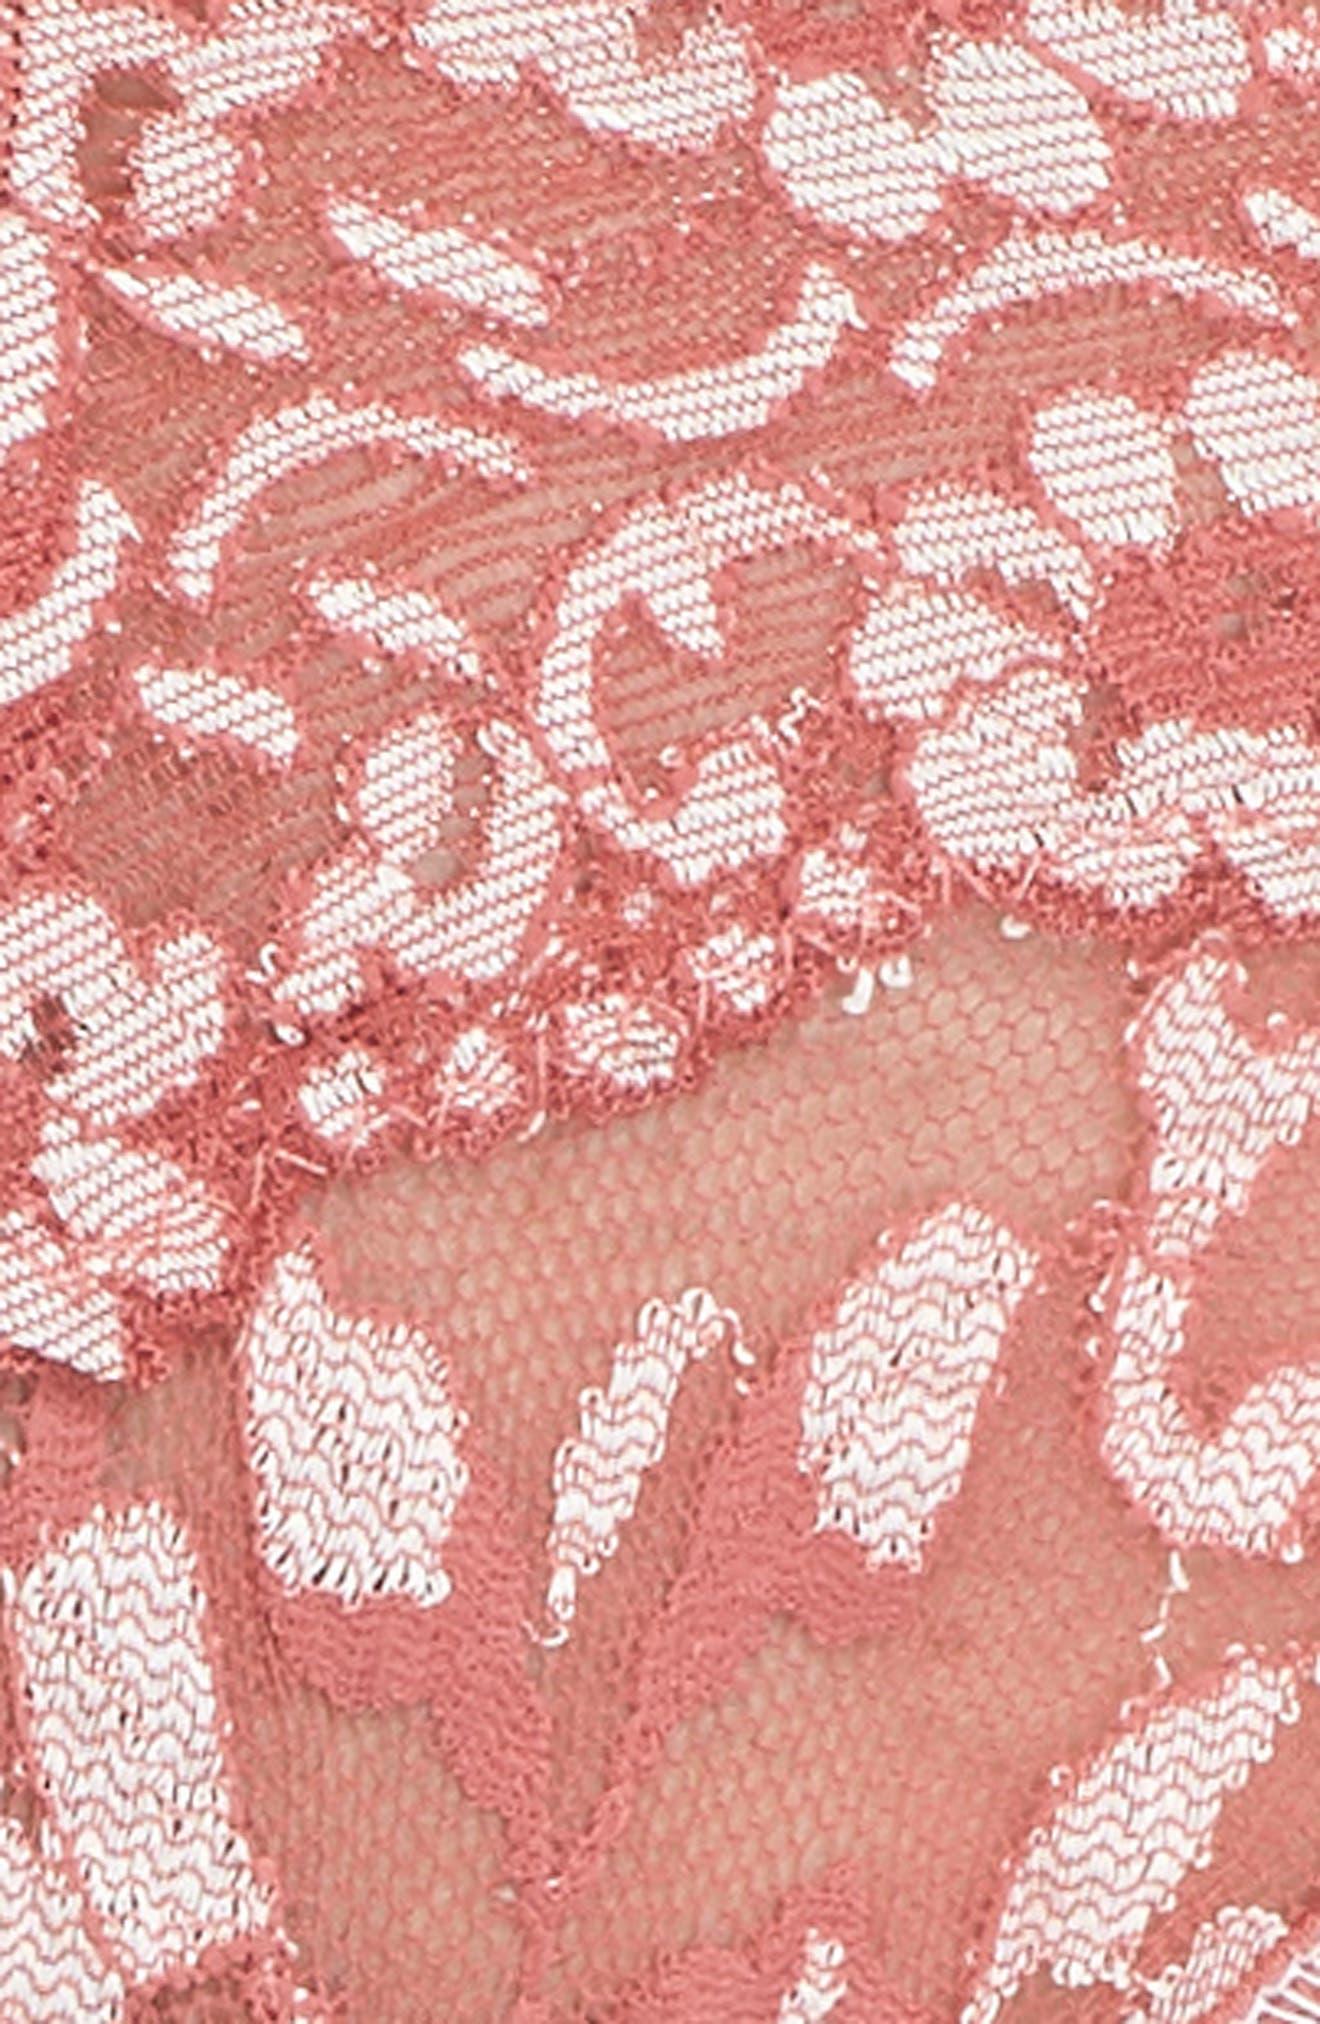 Cross Dyed Regular Rise Thong,                             Alternate thumbnail 5, color,                             Pink Sands/ Marshmallow